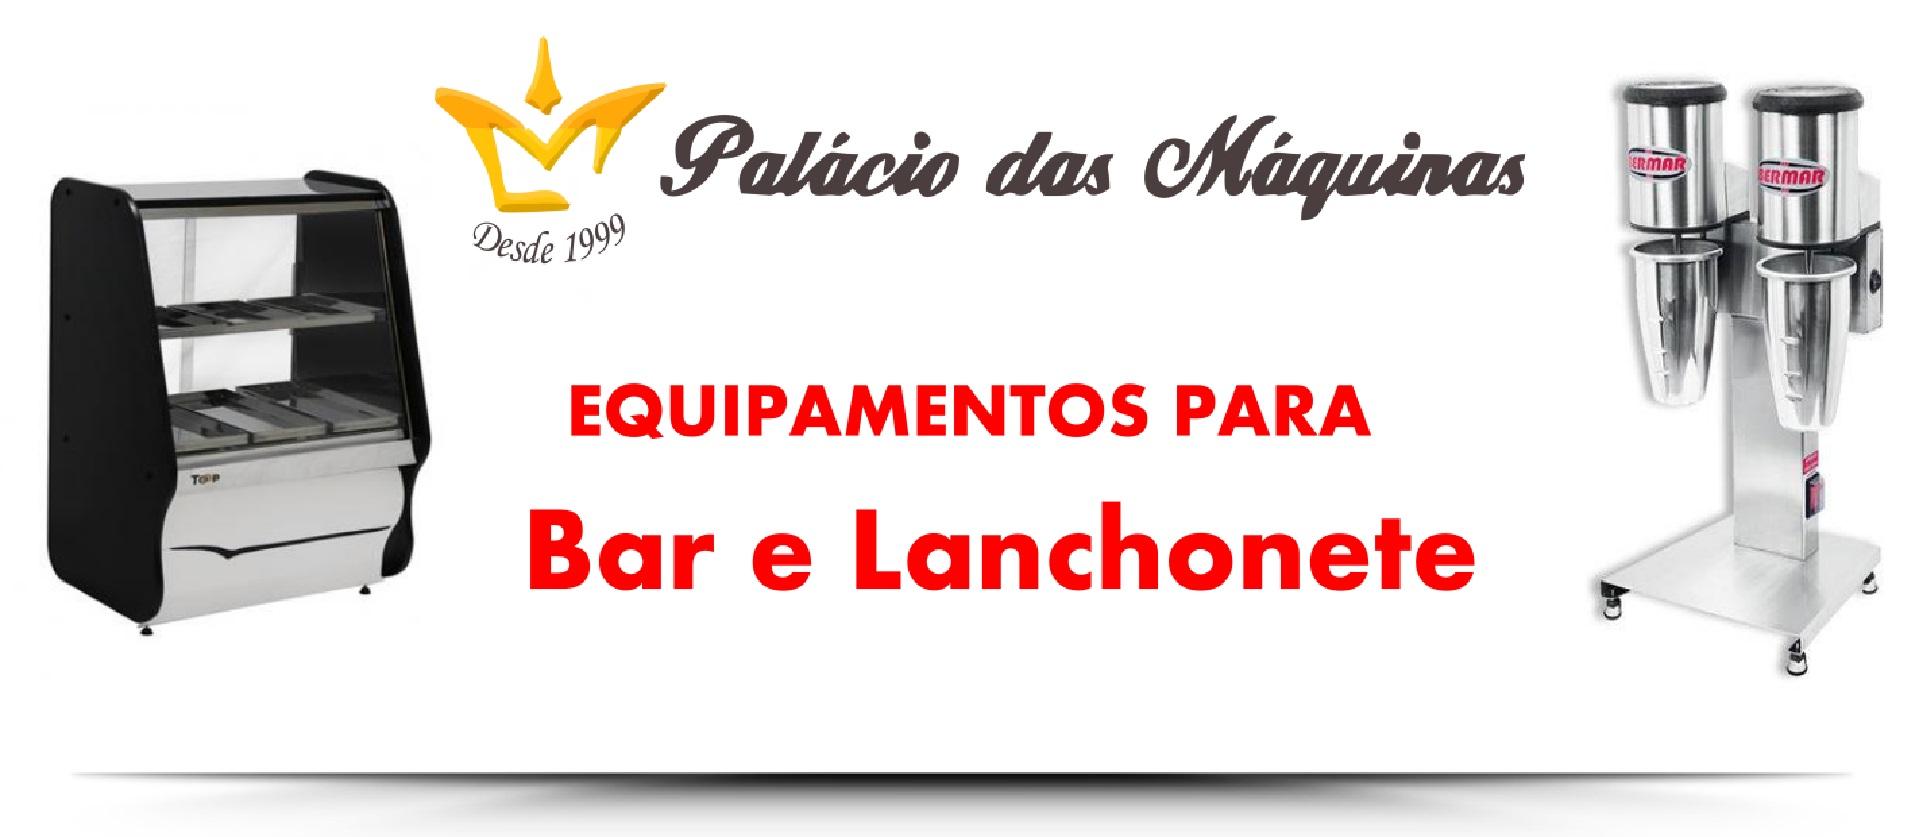 Palacio das Máquinas Equipamentos para Estabelecimentos Comerciais Bar Lanchonete